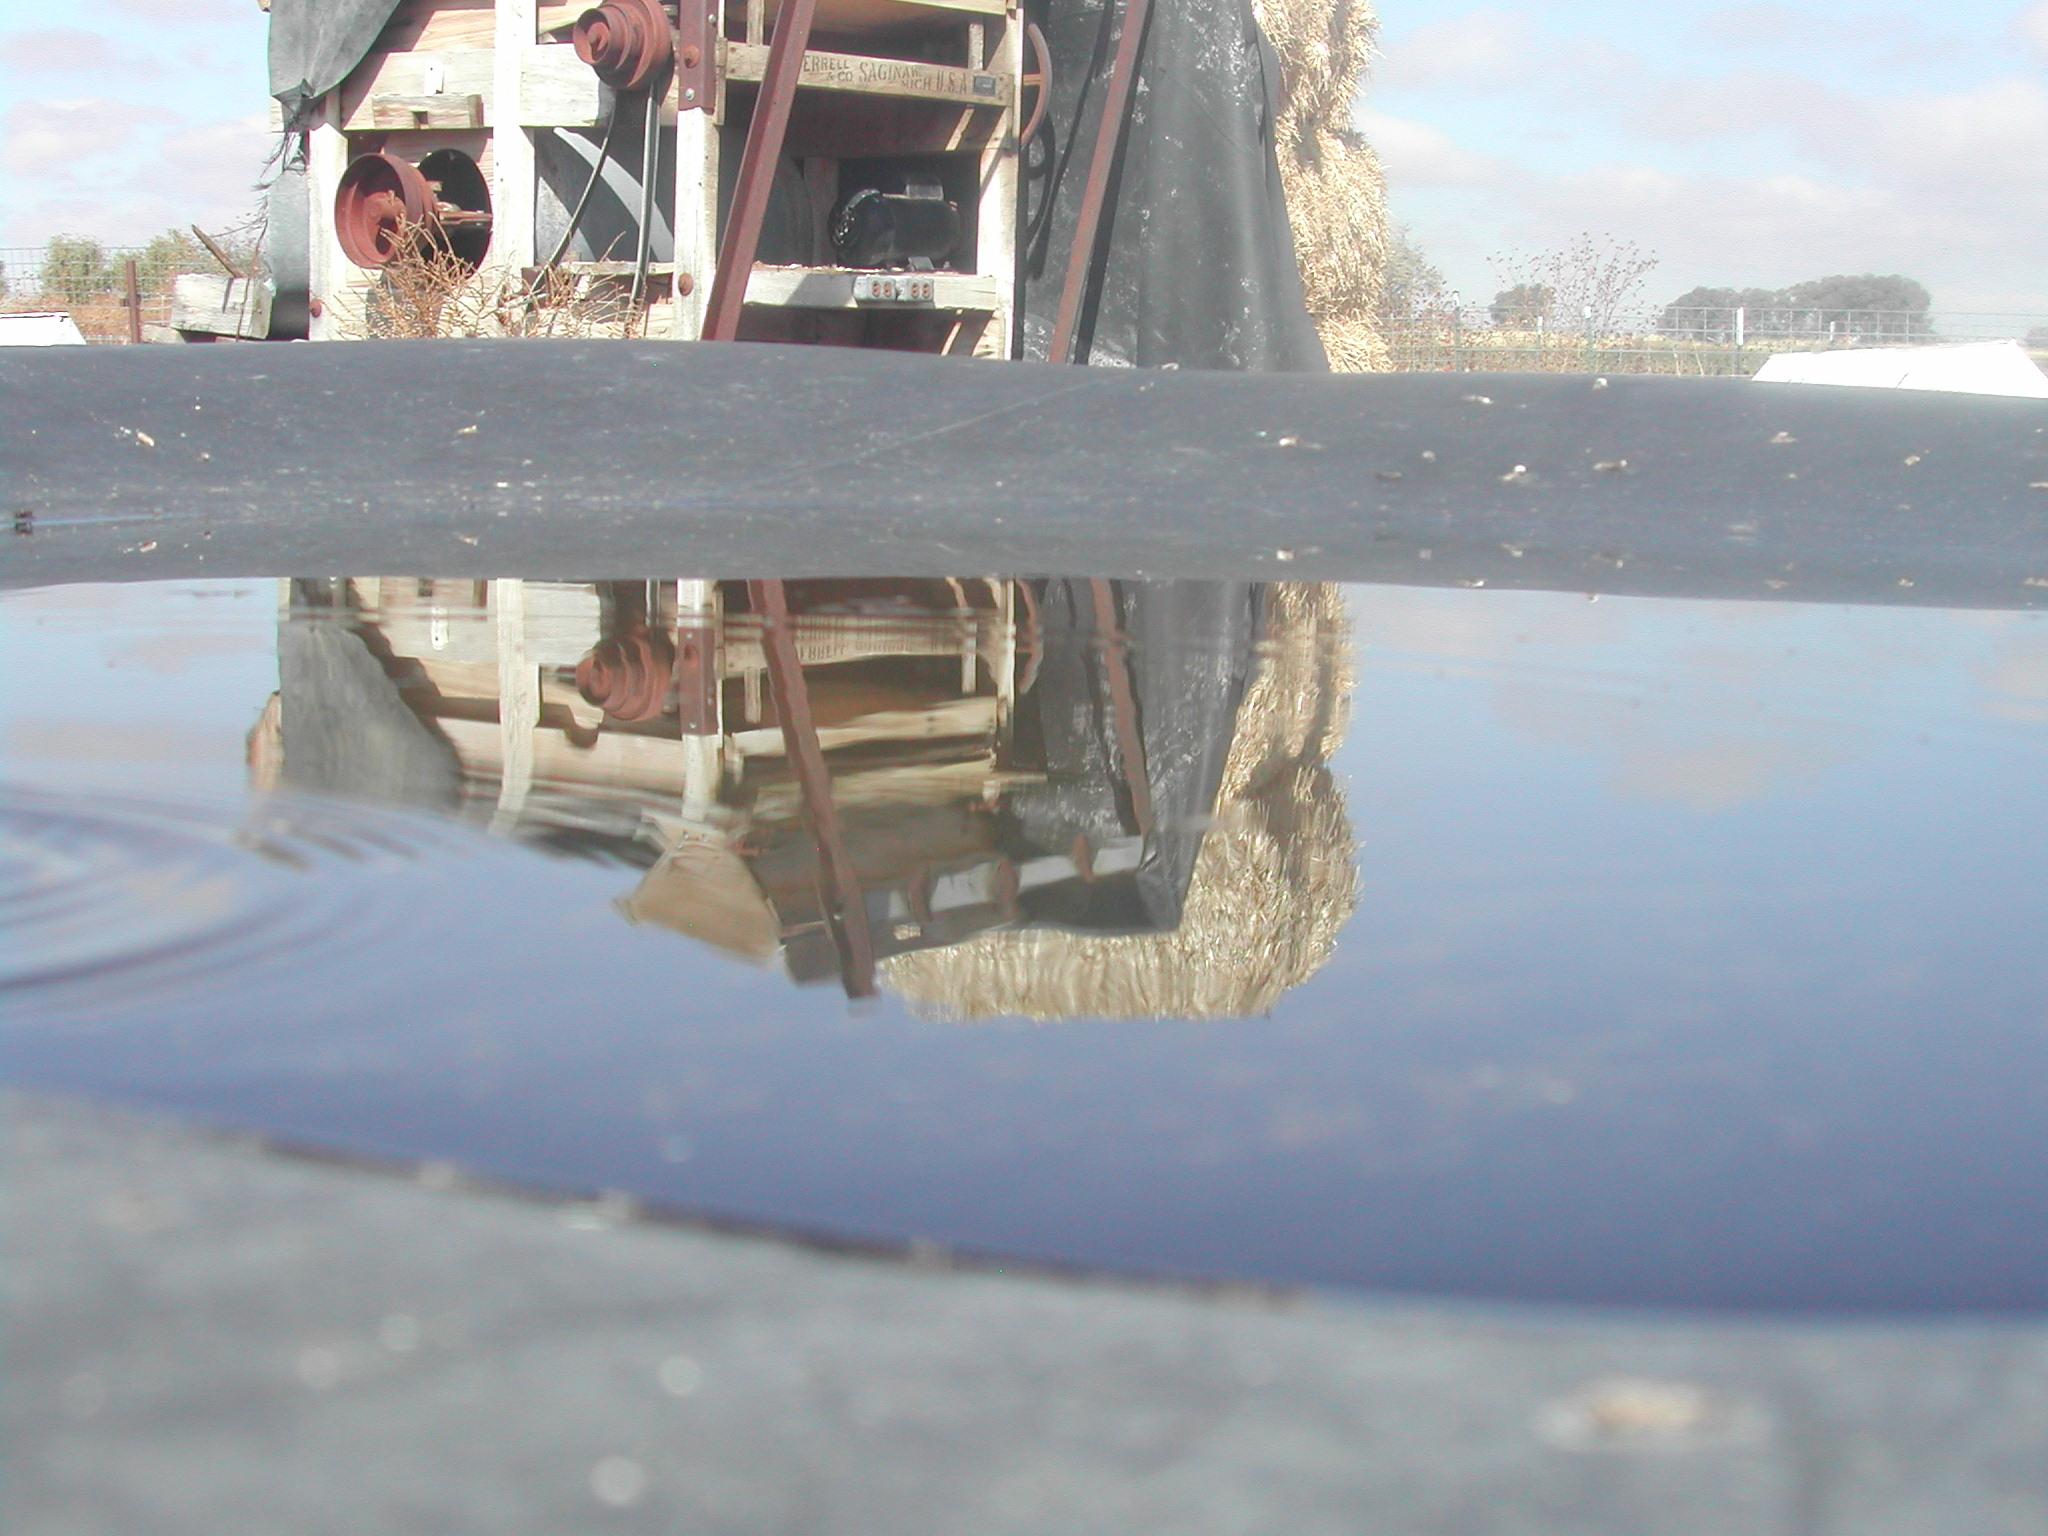 Farm reflections, Bspo06, Farm, Pool, Reflection, HQ Photo